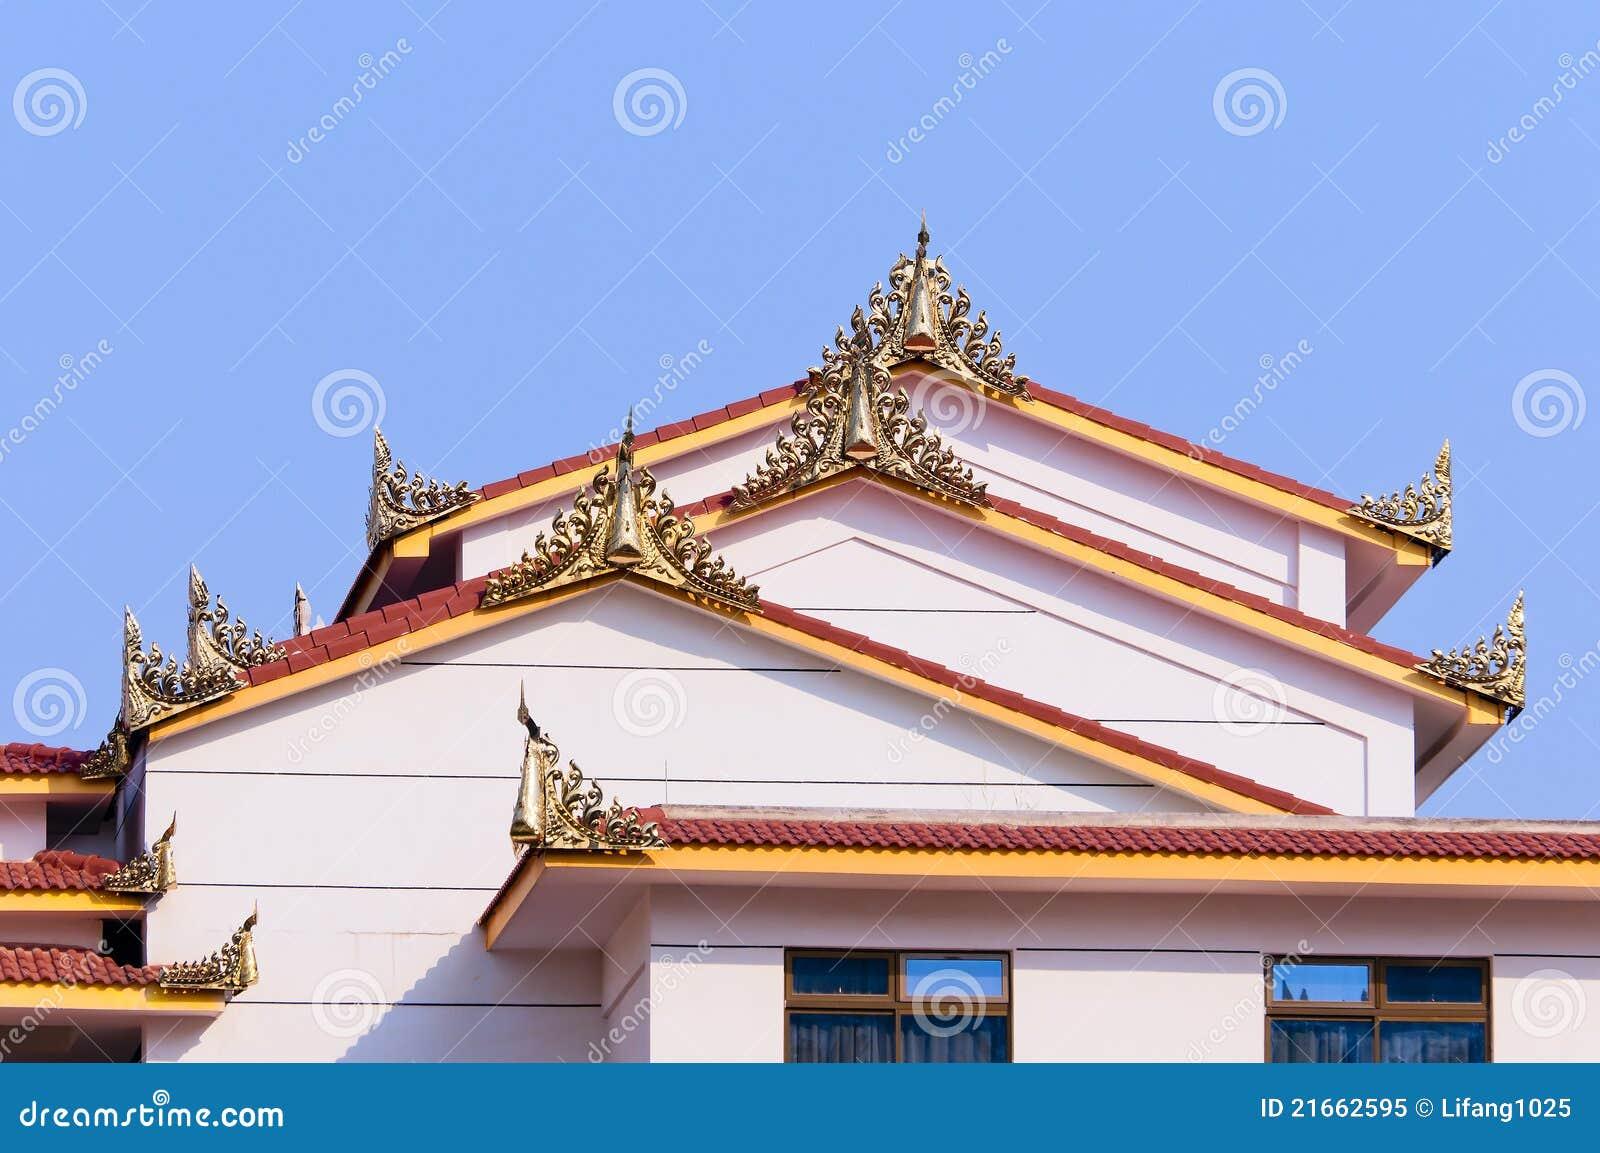 Burma House Royalty Free Stock Photo Image 21662595